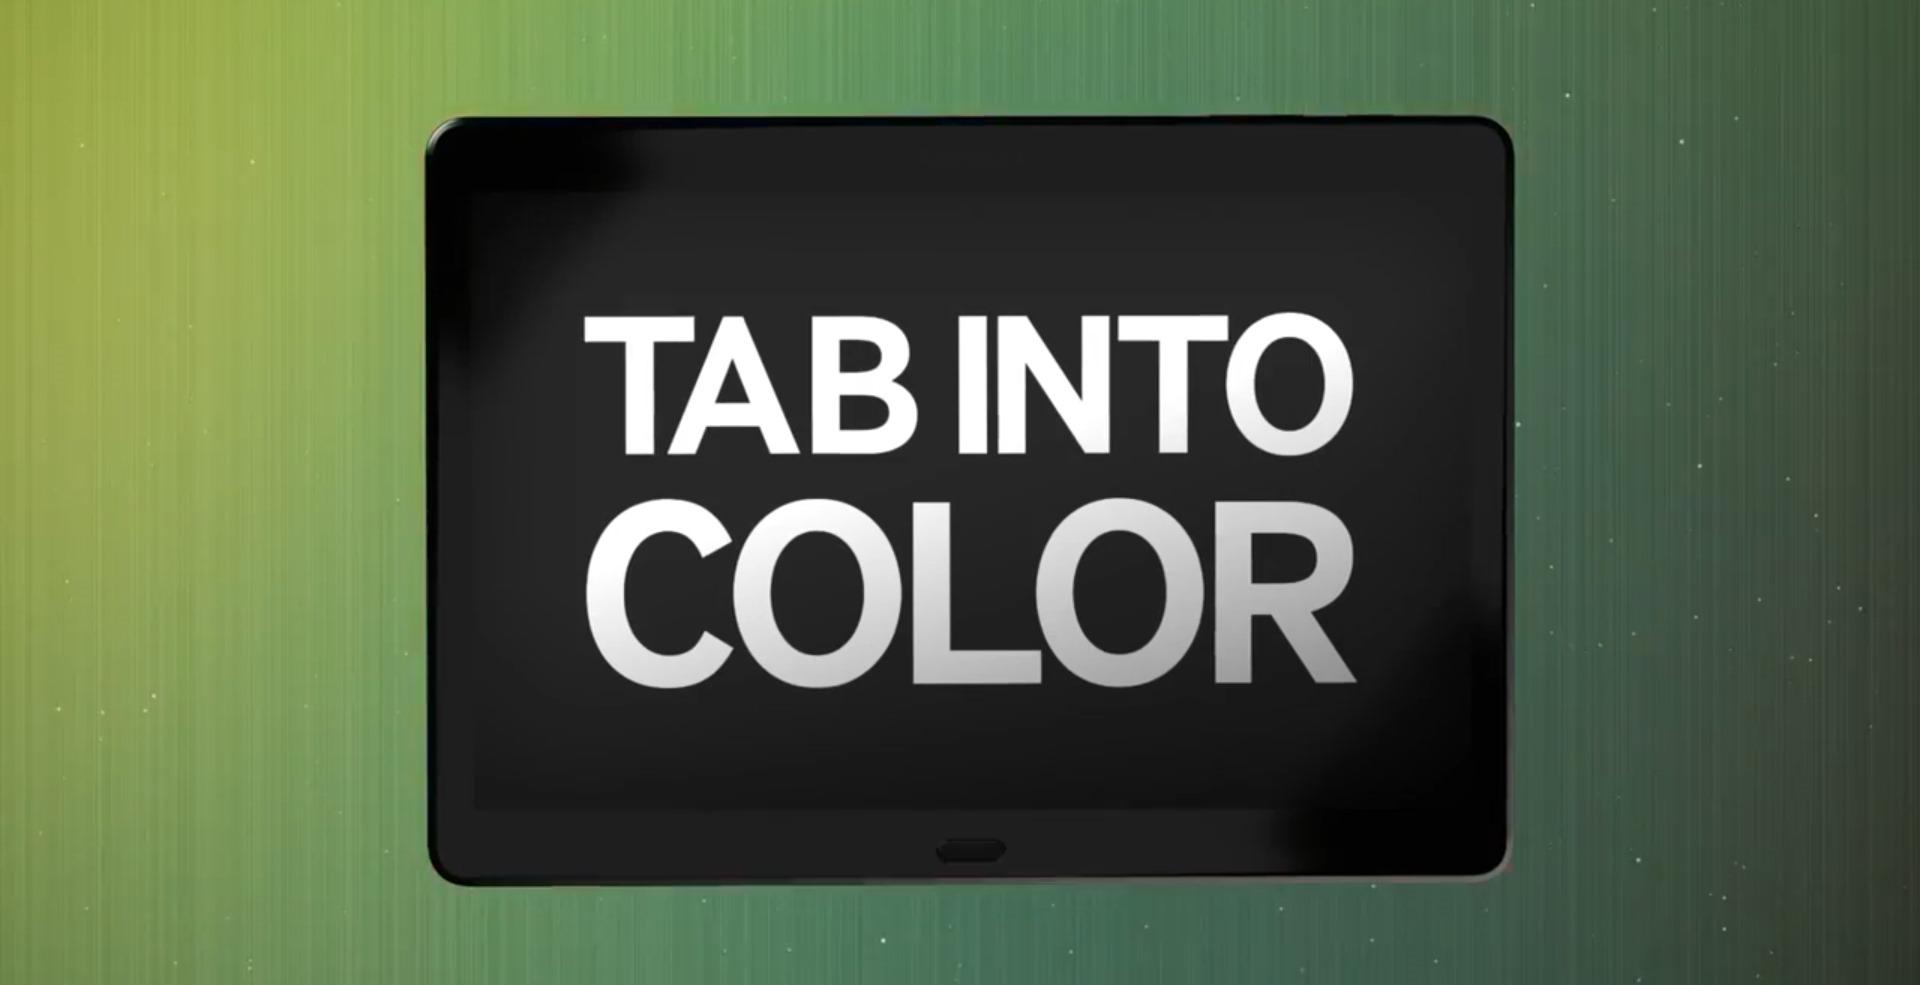 Samsung ปล่อย คลิป นับถอยหลังสู่งาน Galaxy Premier 2014 เตรียมเปิดตัว Galaxy Tab S